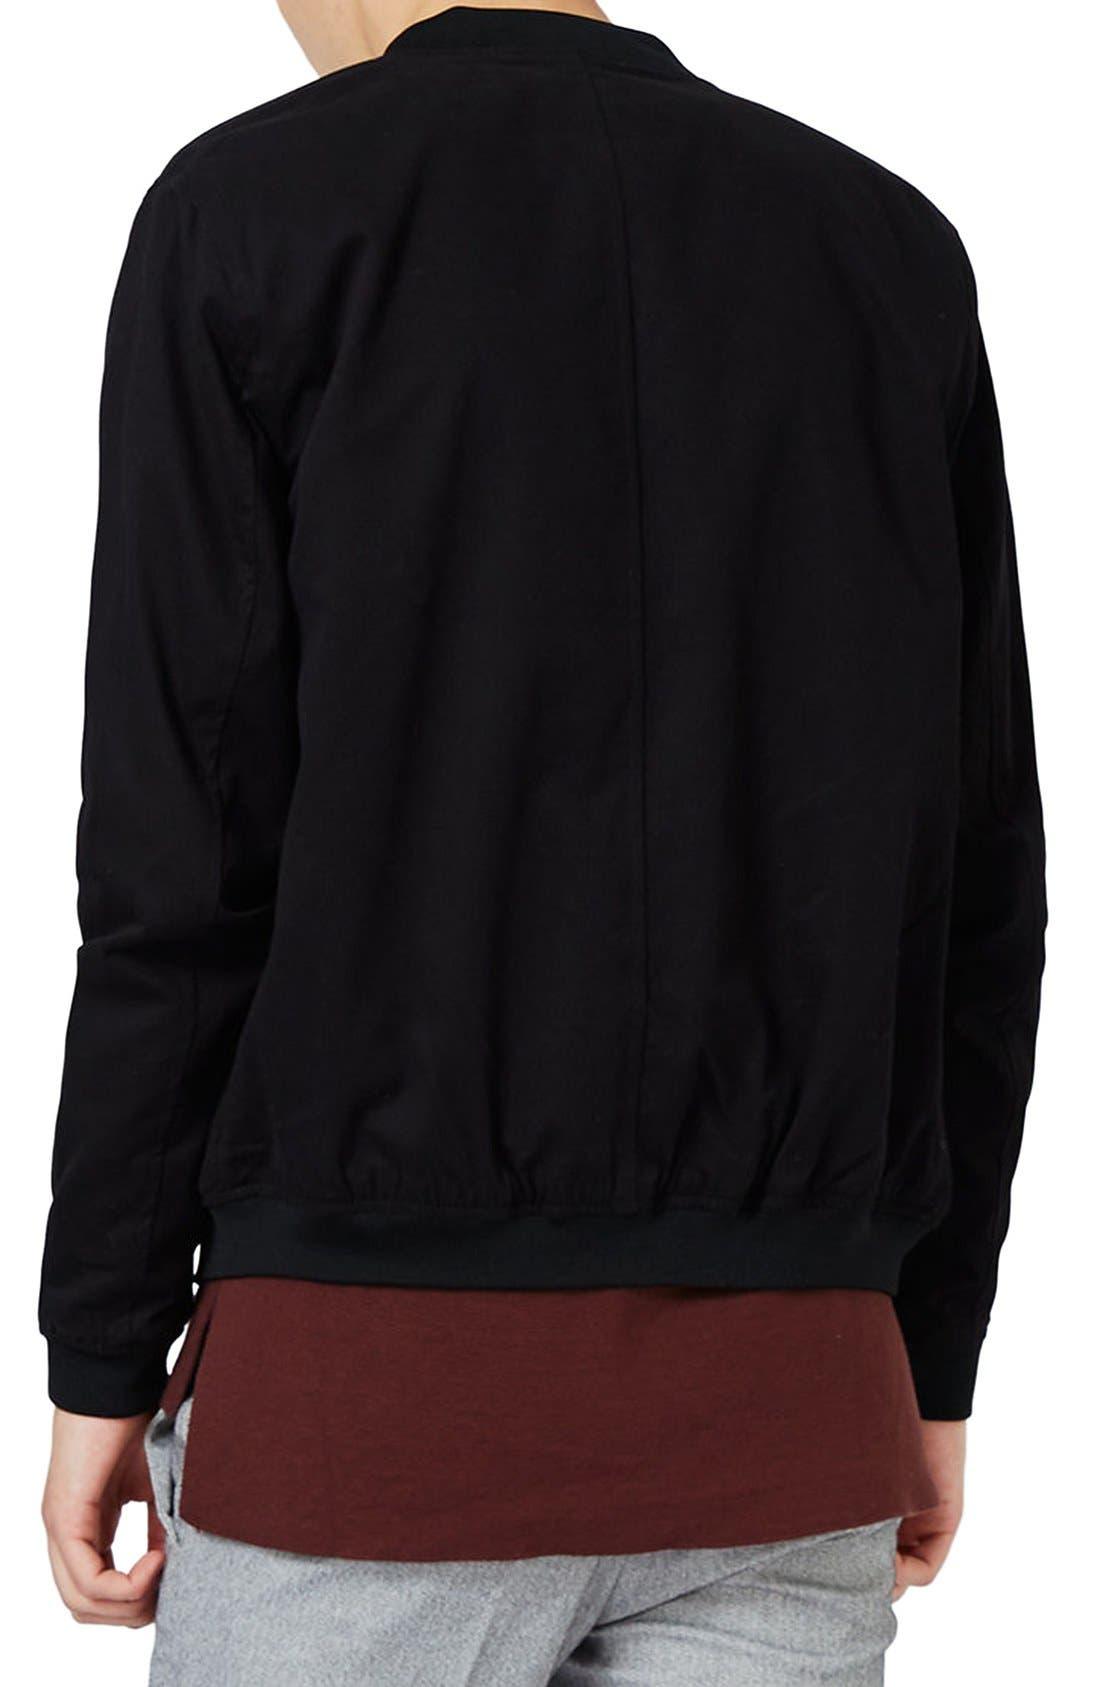 Cotton Bomber Jacket,                             Alternate thumbnail 3, color,                             Black